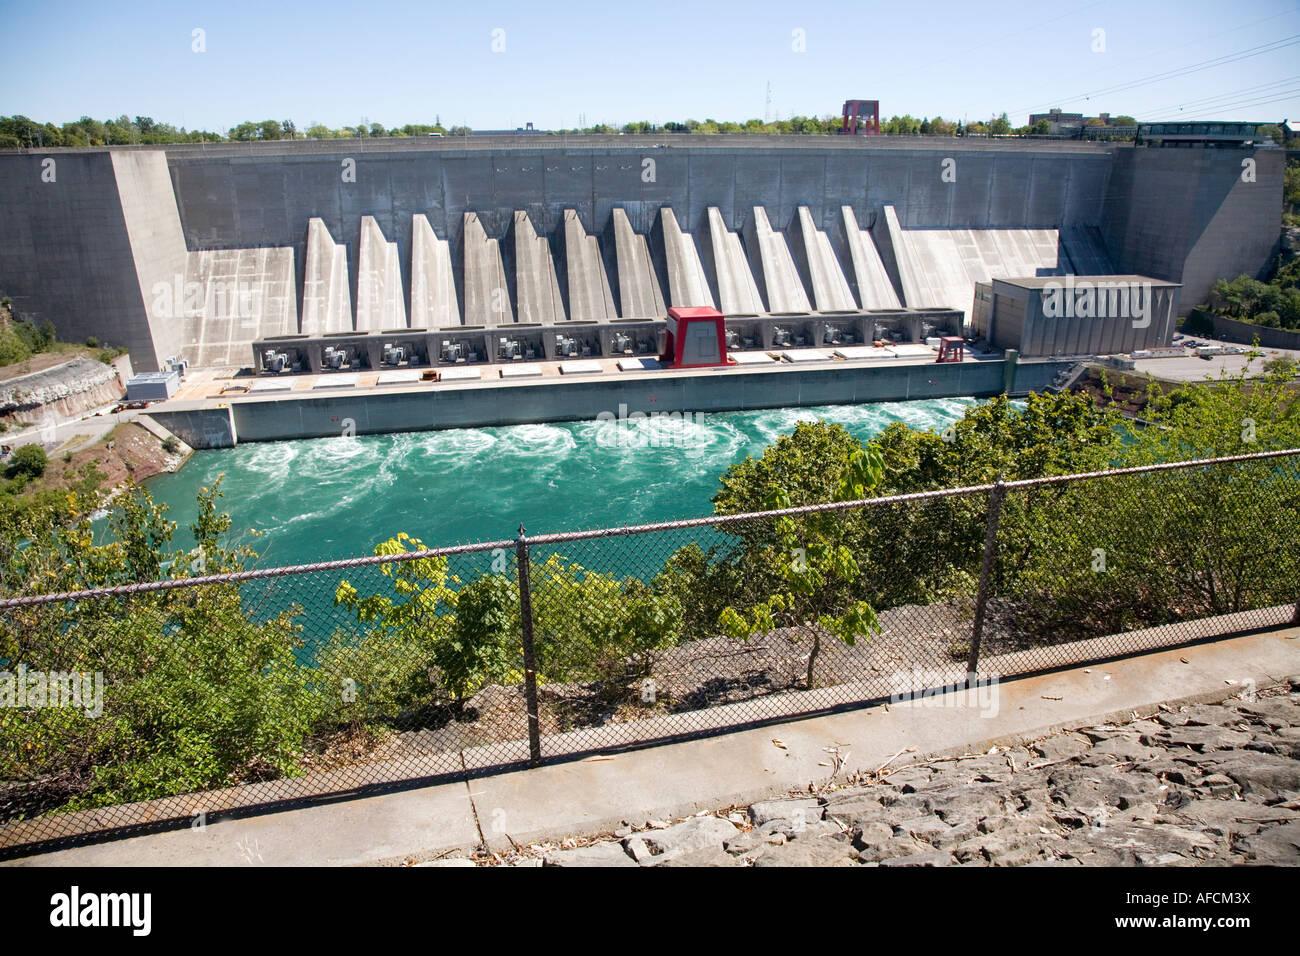 Hydro plant Niagara River Ontario Canada;Hydro Power or alternative power - Stock Image